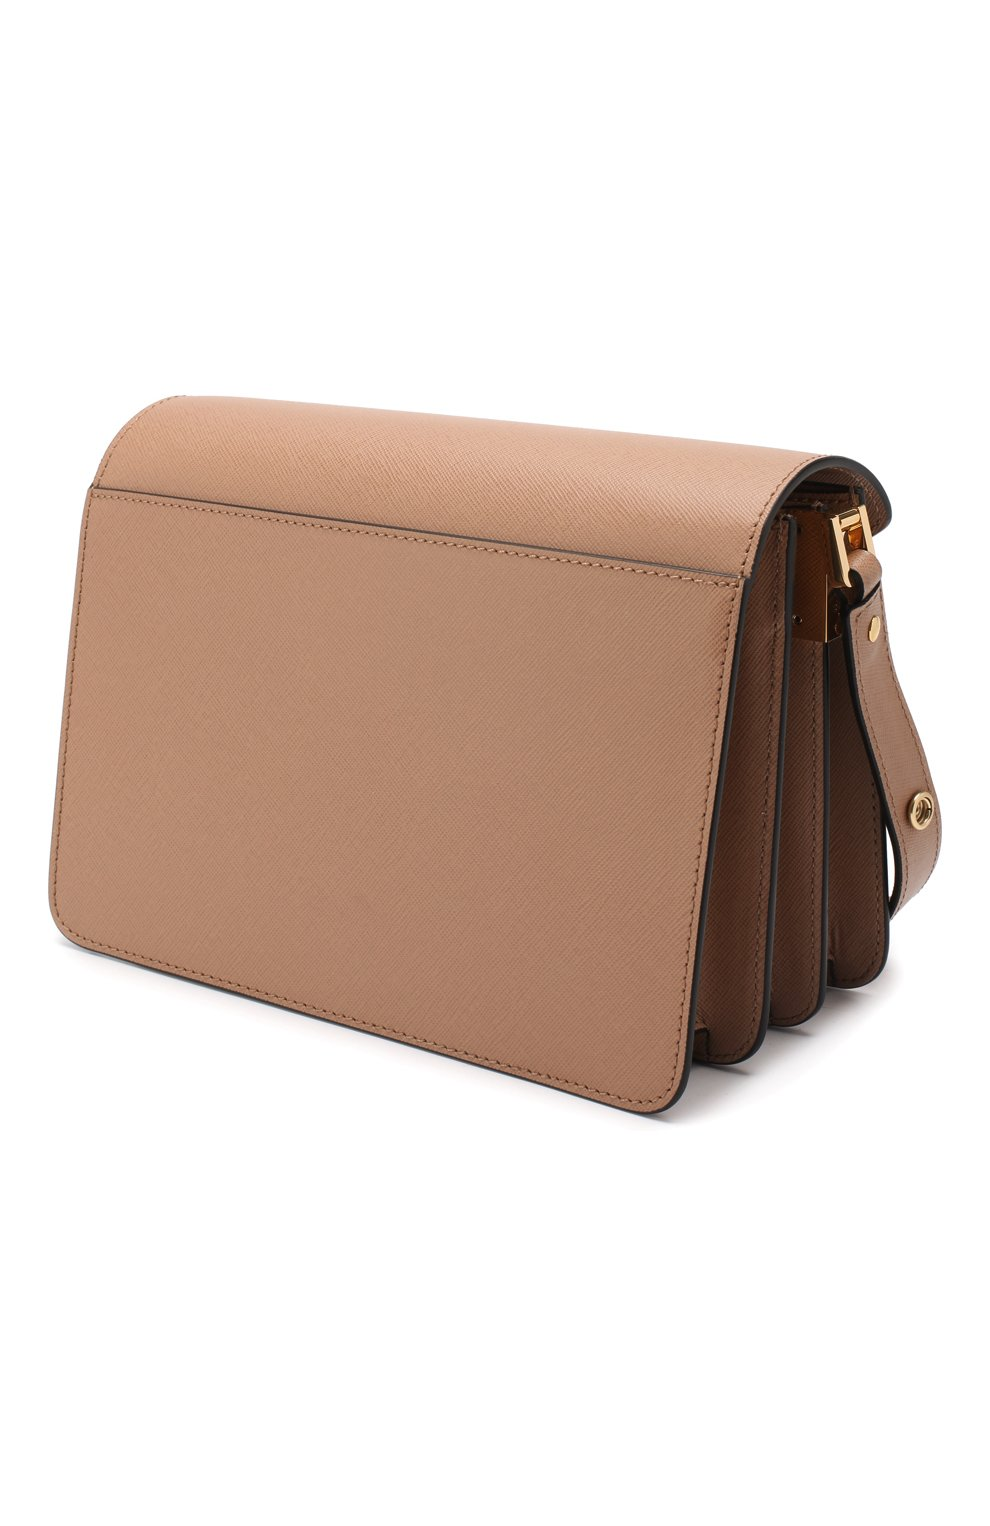 Женская сумка trunk MARNI светло-коричневого цвета, арт. SBMPN09N01/LV520 | Фото 3